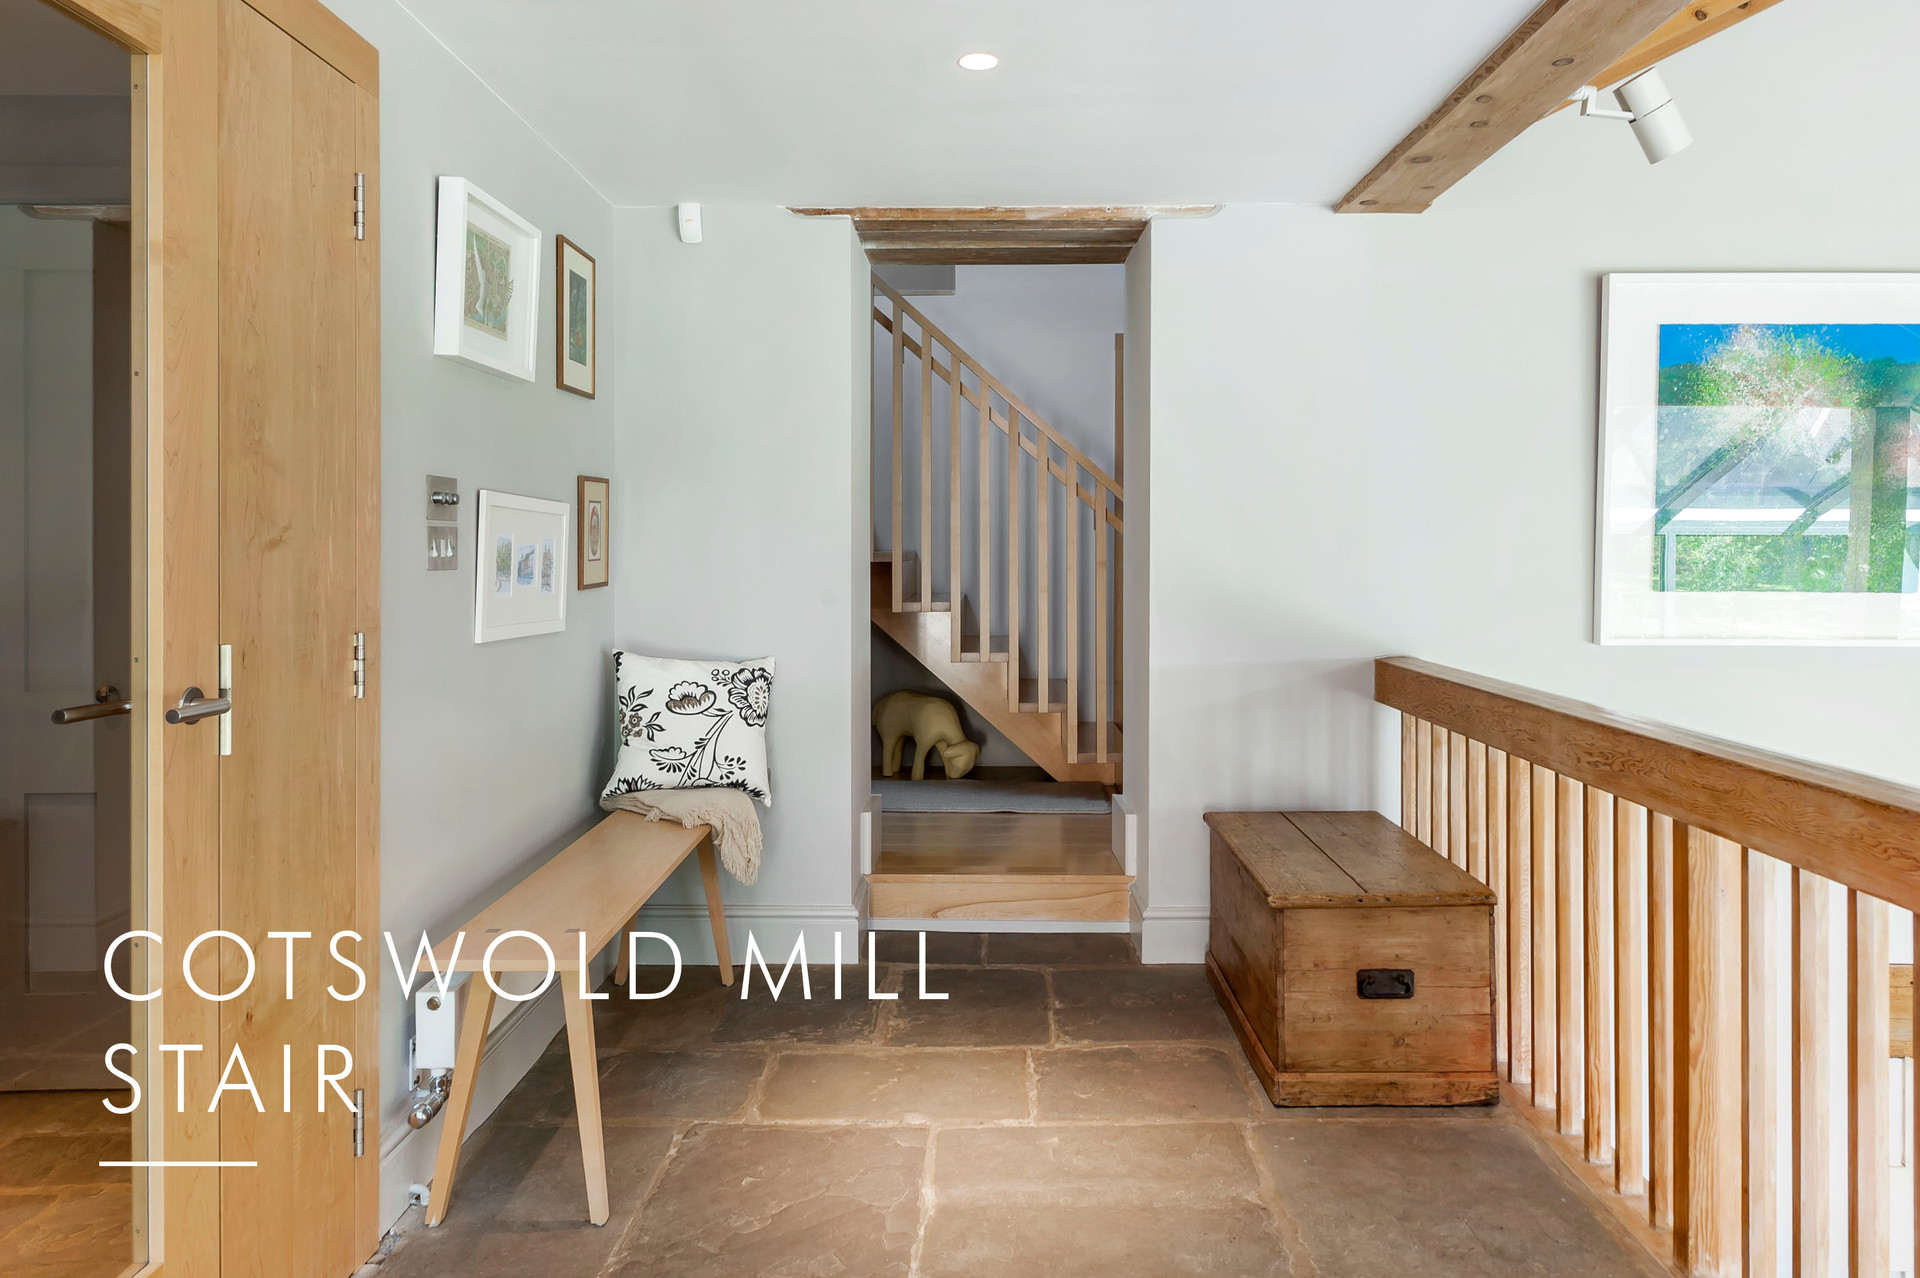 Cotswold Mill Stair Headline.jpg